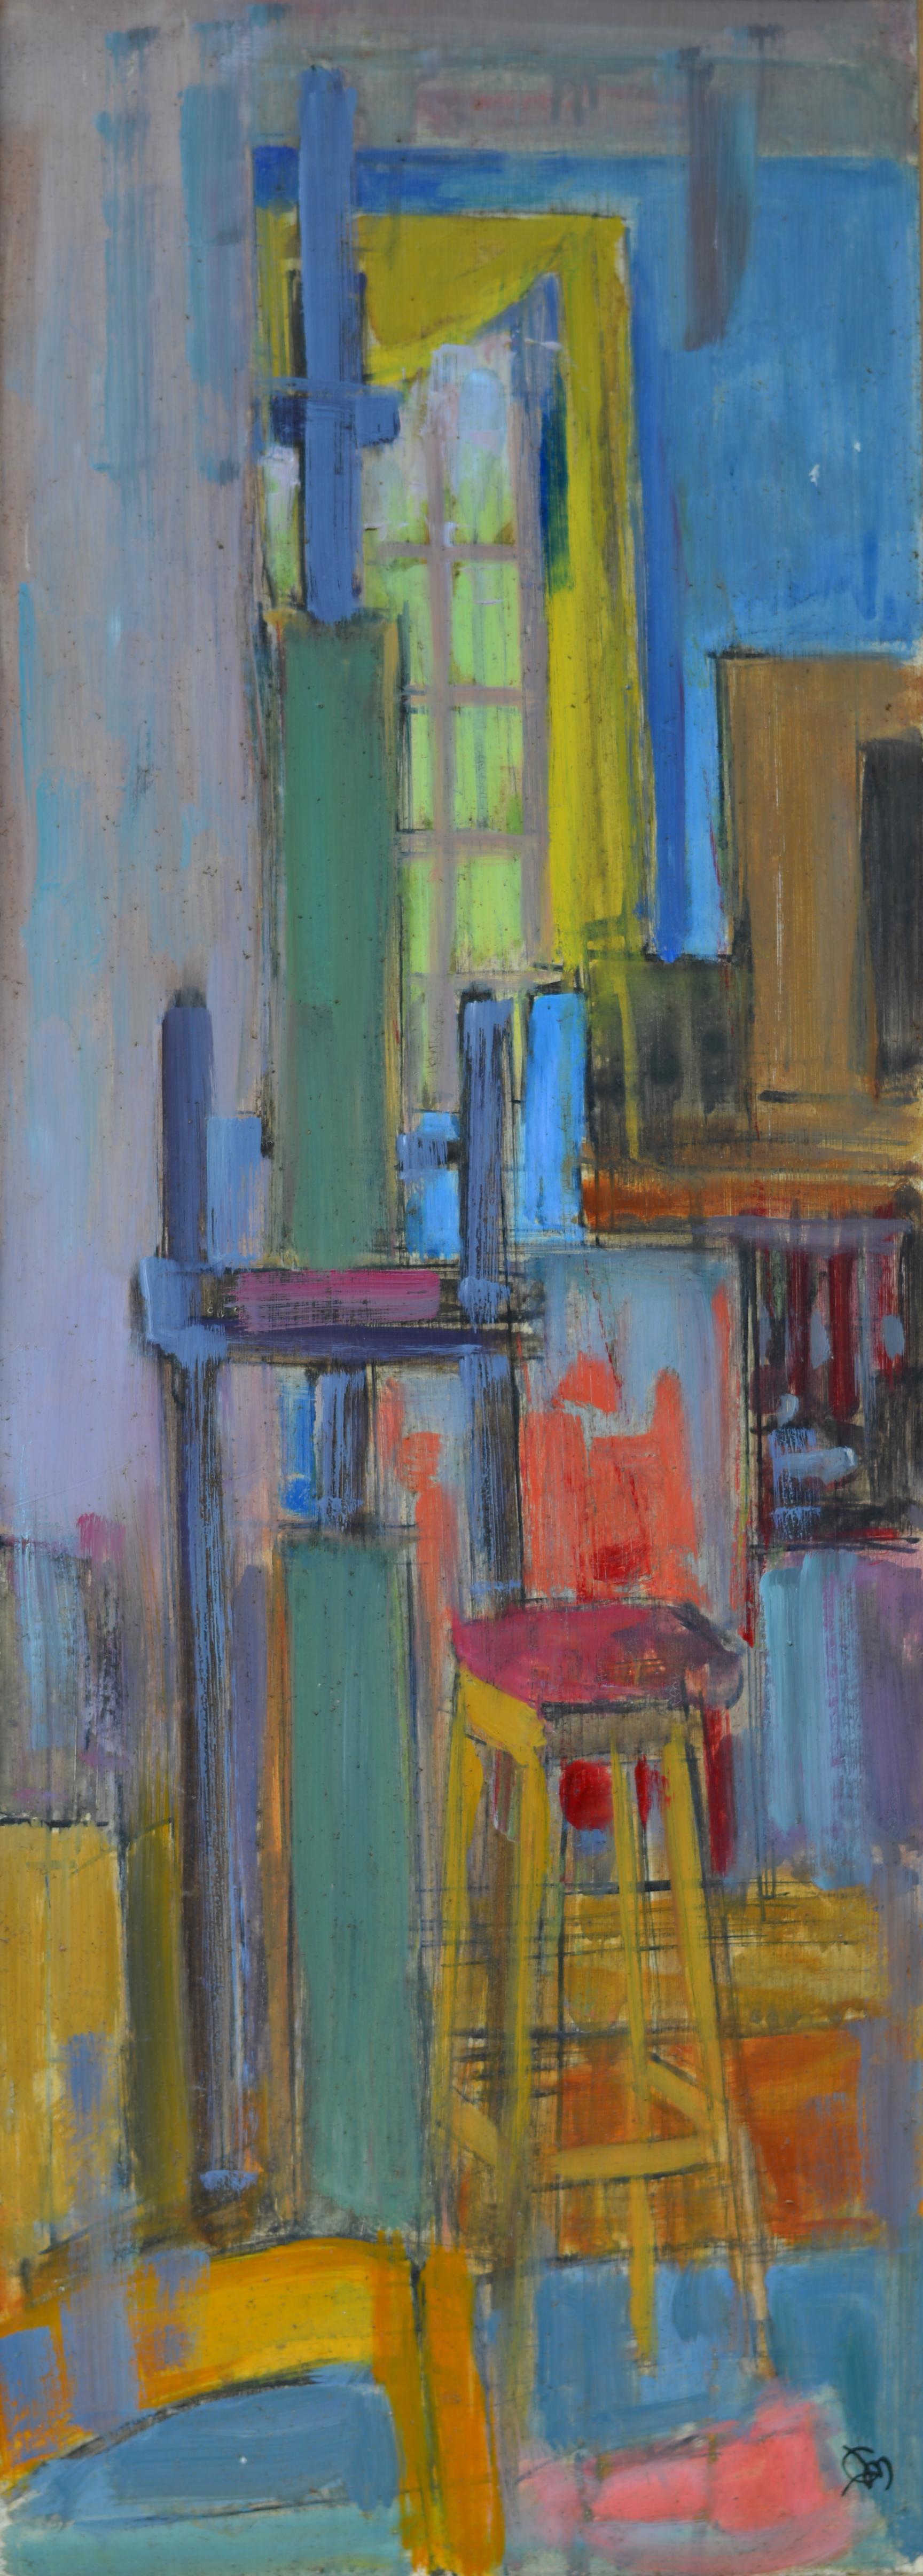 700. Atelier. Huile sur Isorel. 73 x 27.